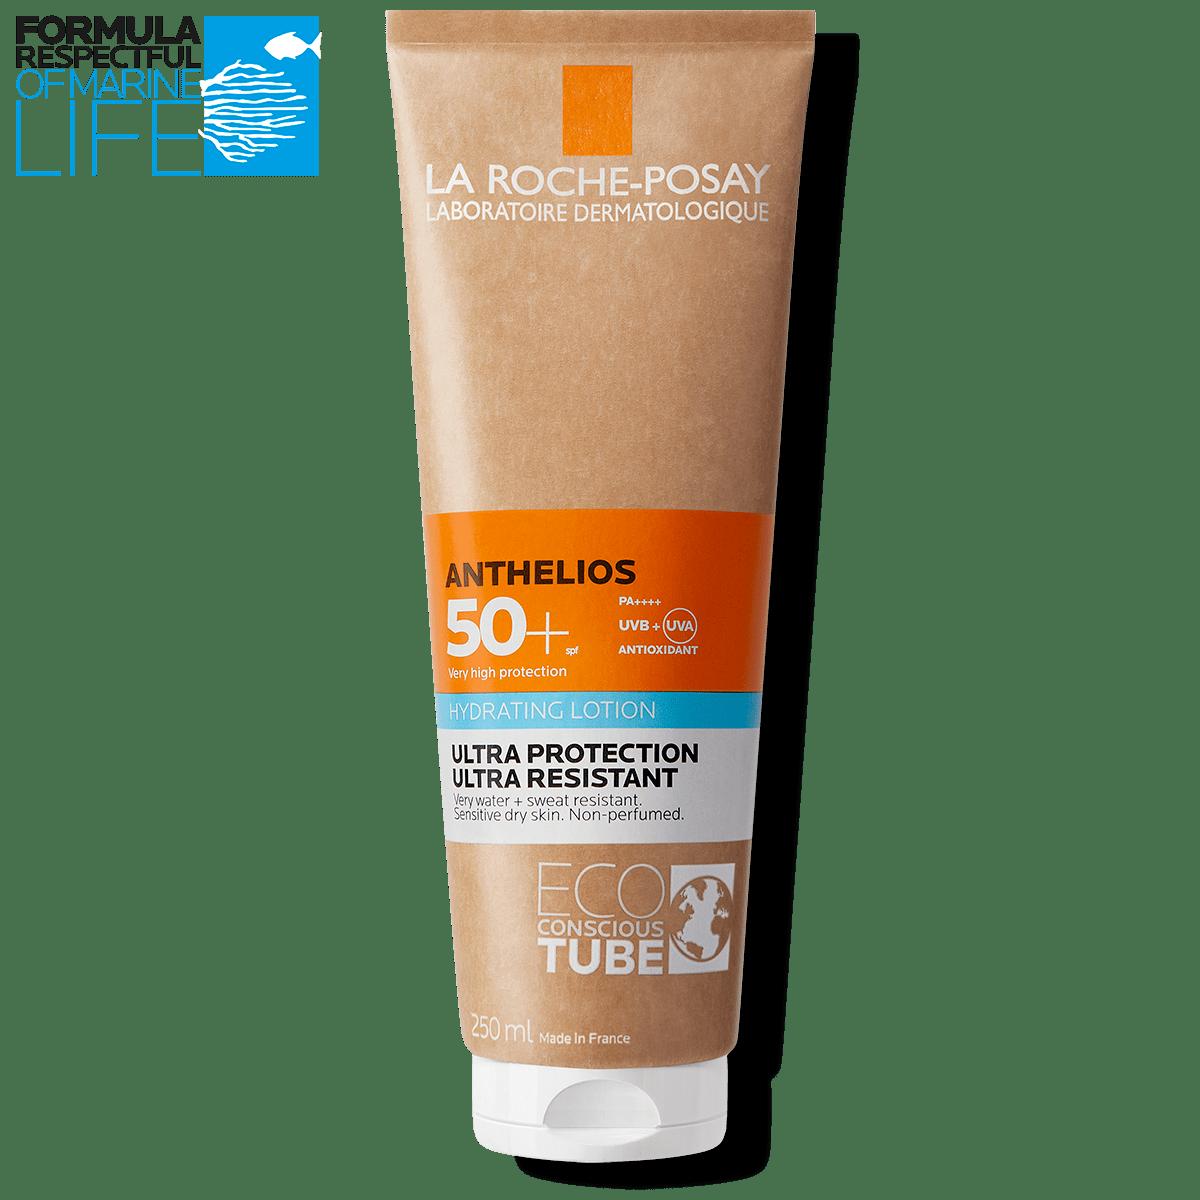 Tube-eco-conscious-spf50